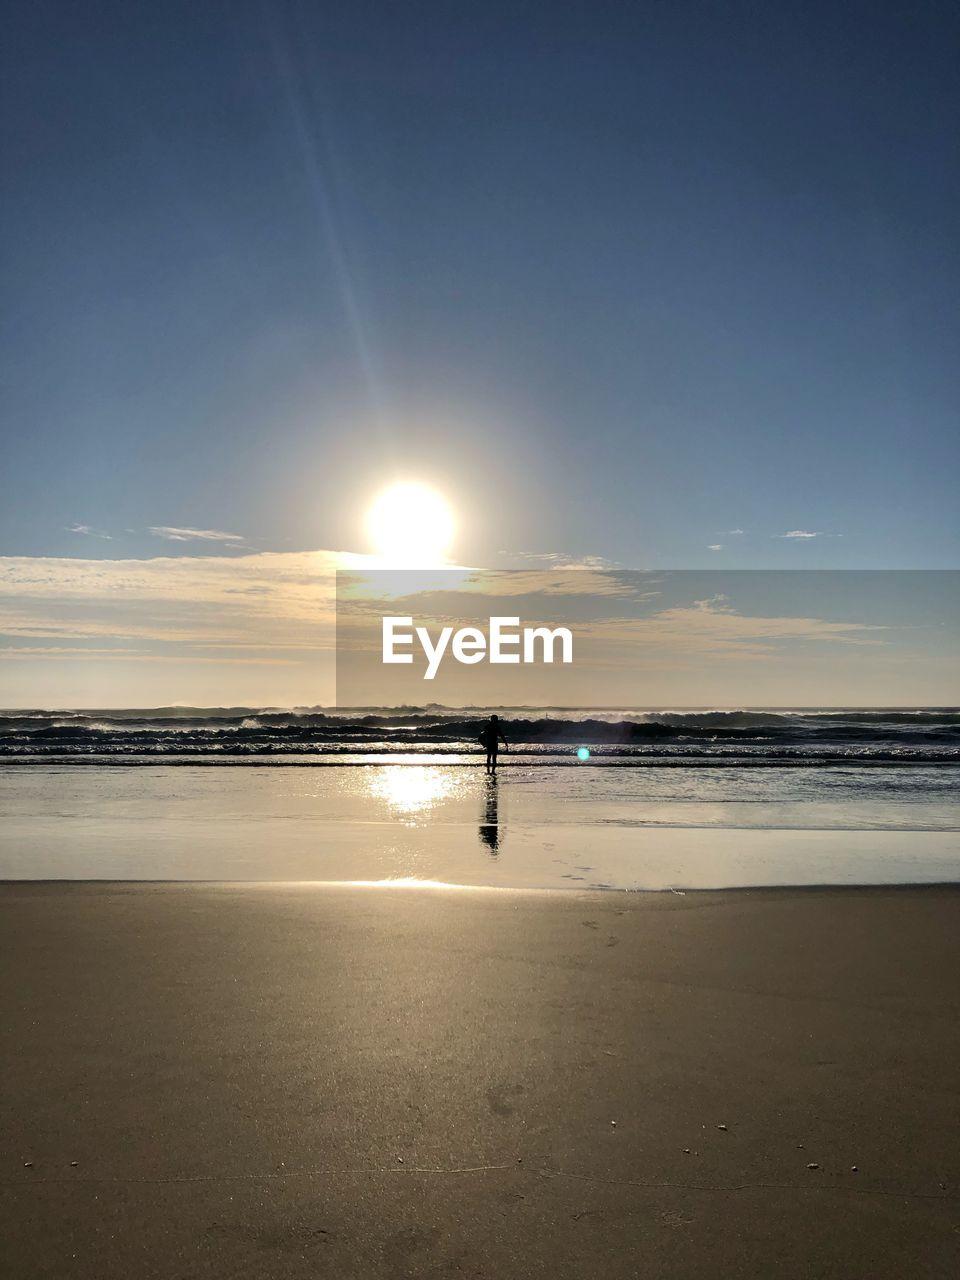 sky, water, scenics - nature, beauty in nature, land, beach, sea, tranquil scene, tranquility, sun, sunlight, horizon, horizon over water, nature, idyllic, non-urban scene, sunset, reflection, silhouette, outdoors, lens flare, bright